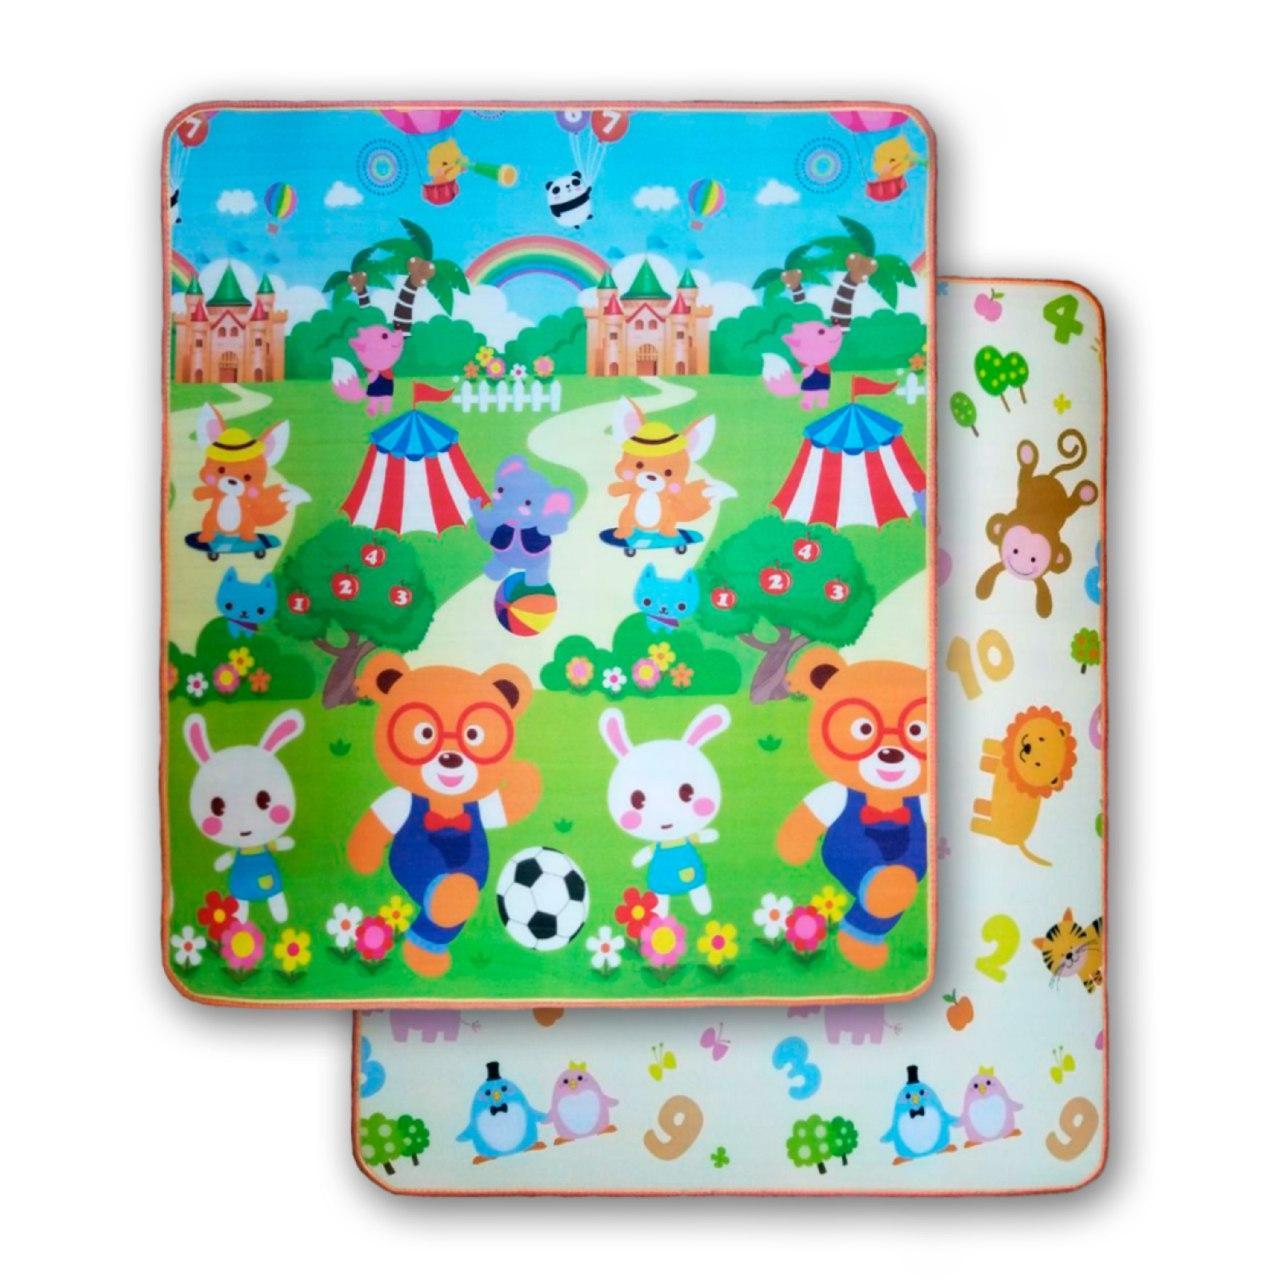 Детский термо-коврик каремат игровой развивающий двухсторонний для игр 10мм ПВХ  1,8 х 1,5 м